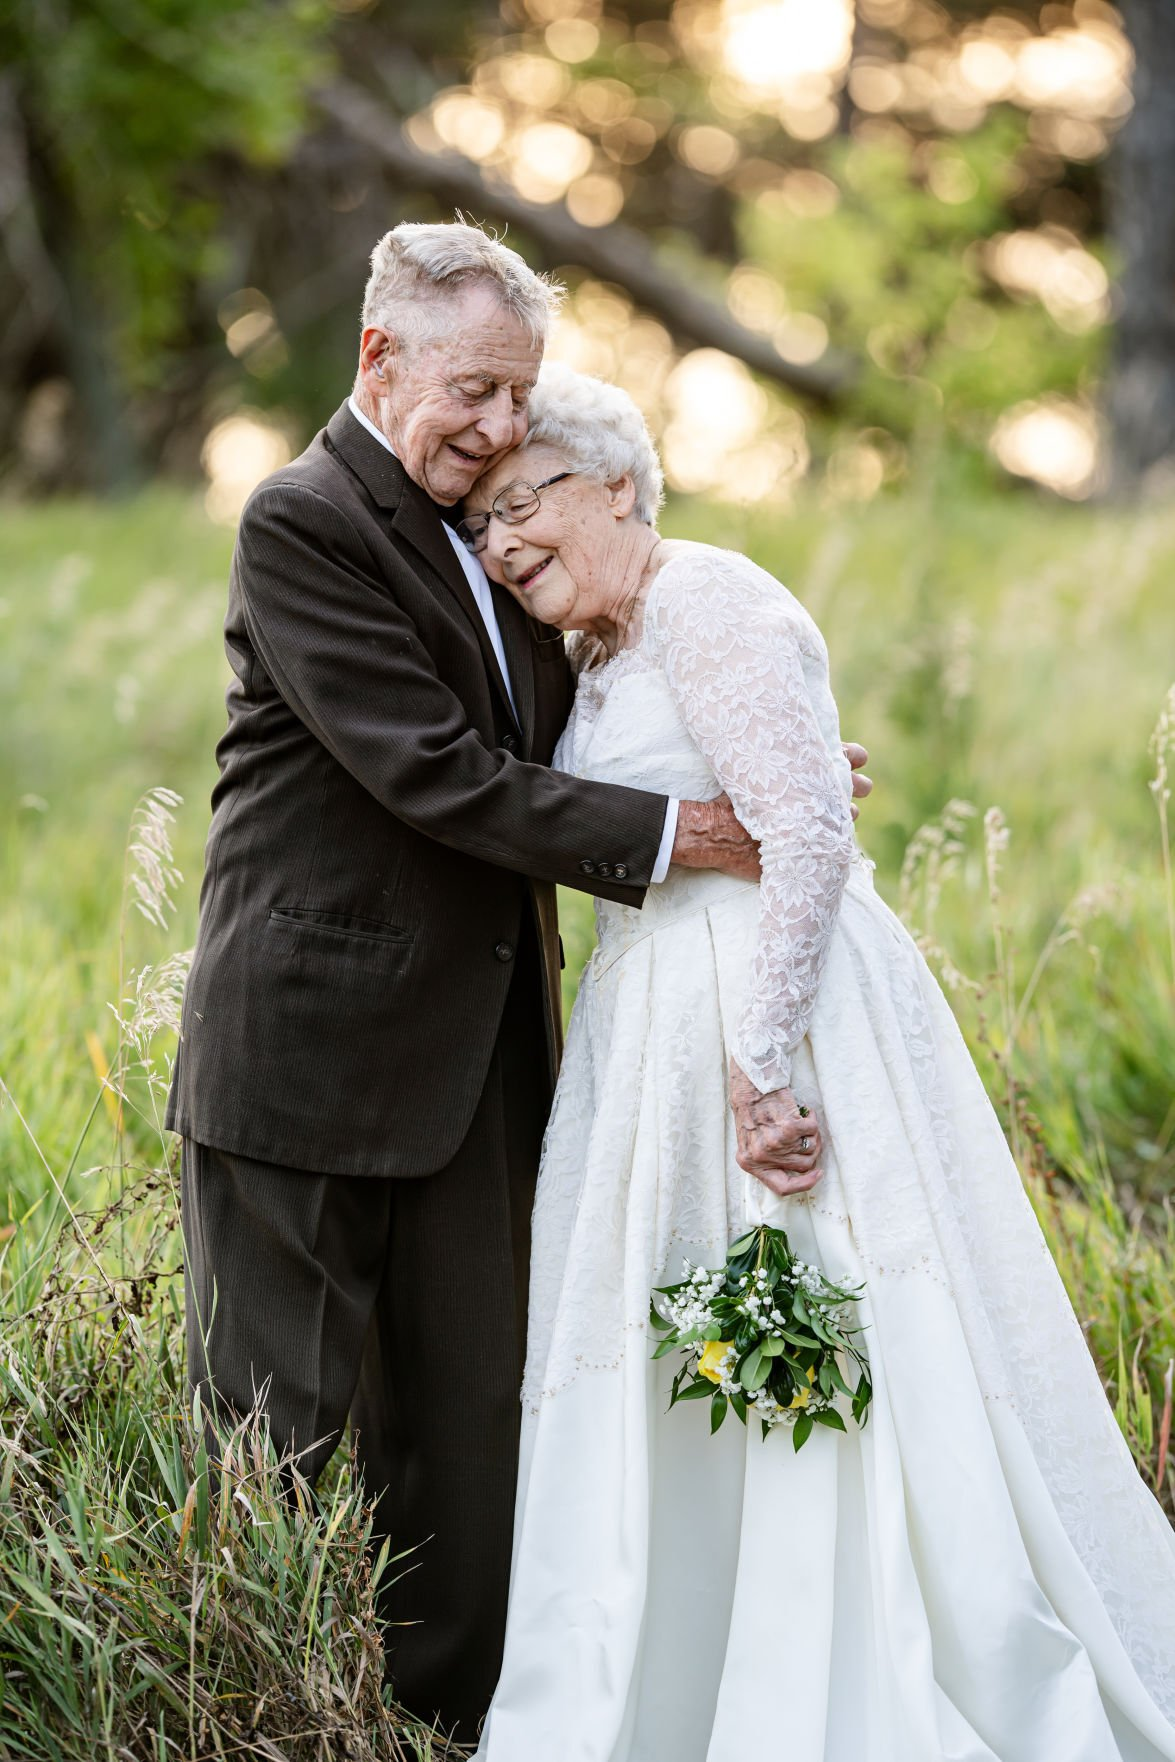 Nebraska Couple Dons Original Wedding Dress Suit In Sweet Photo After 60 Years Of Marriage Weddings Omaha Com